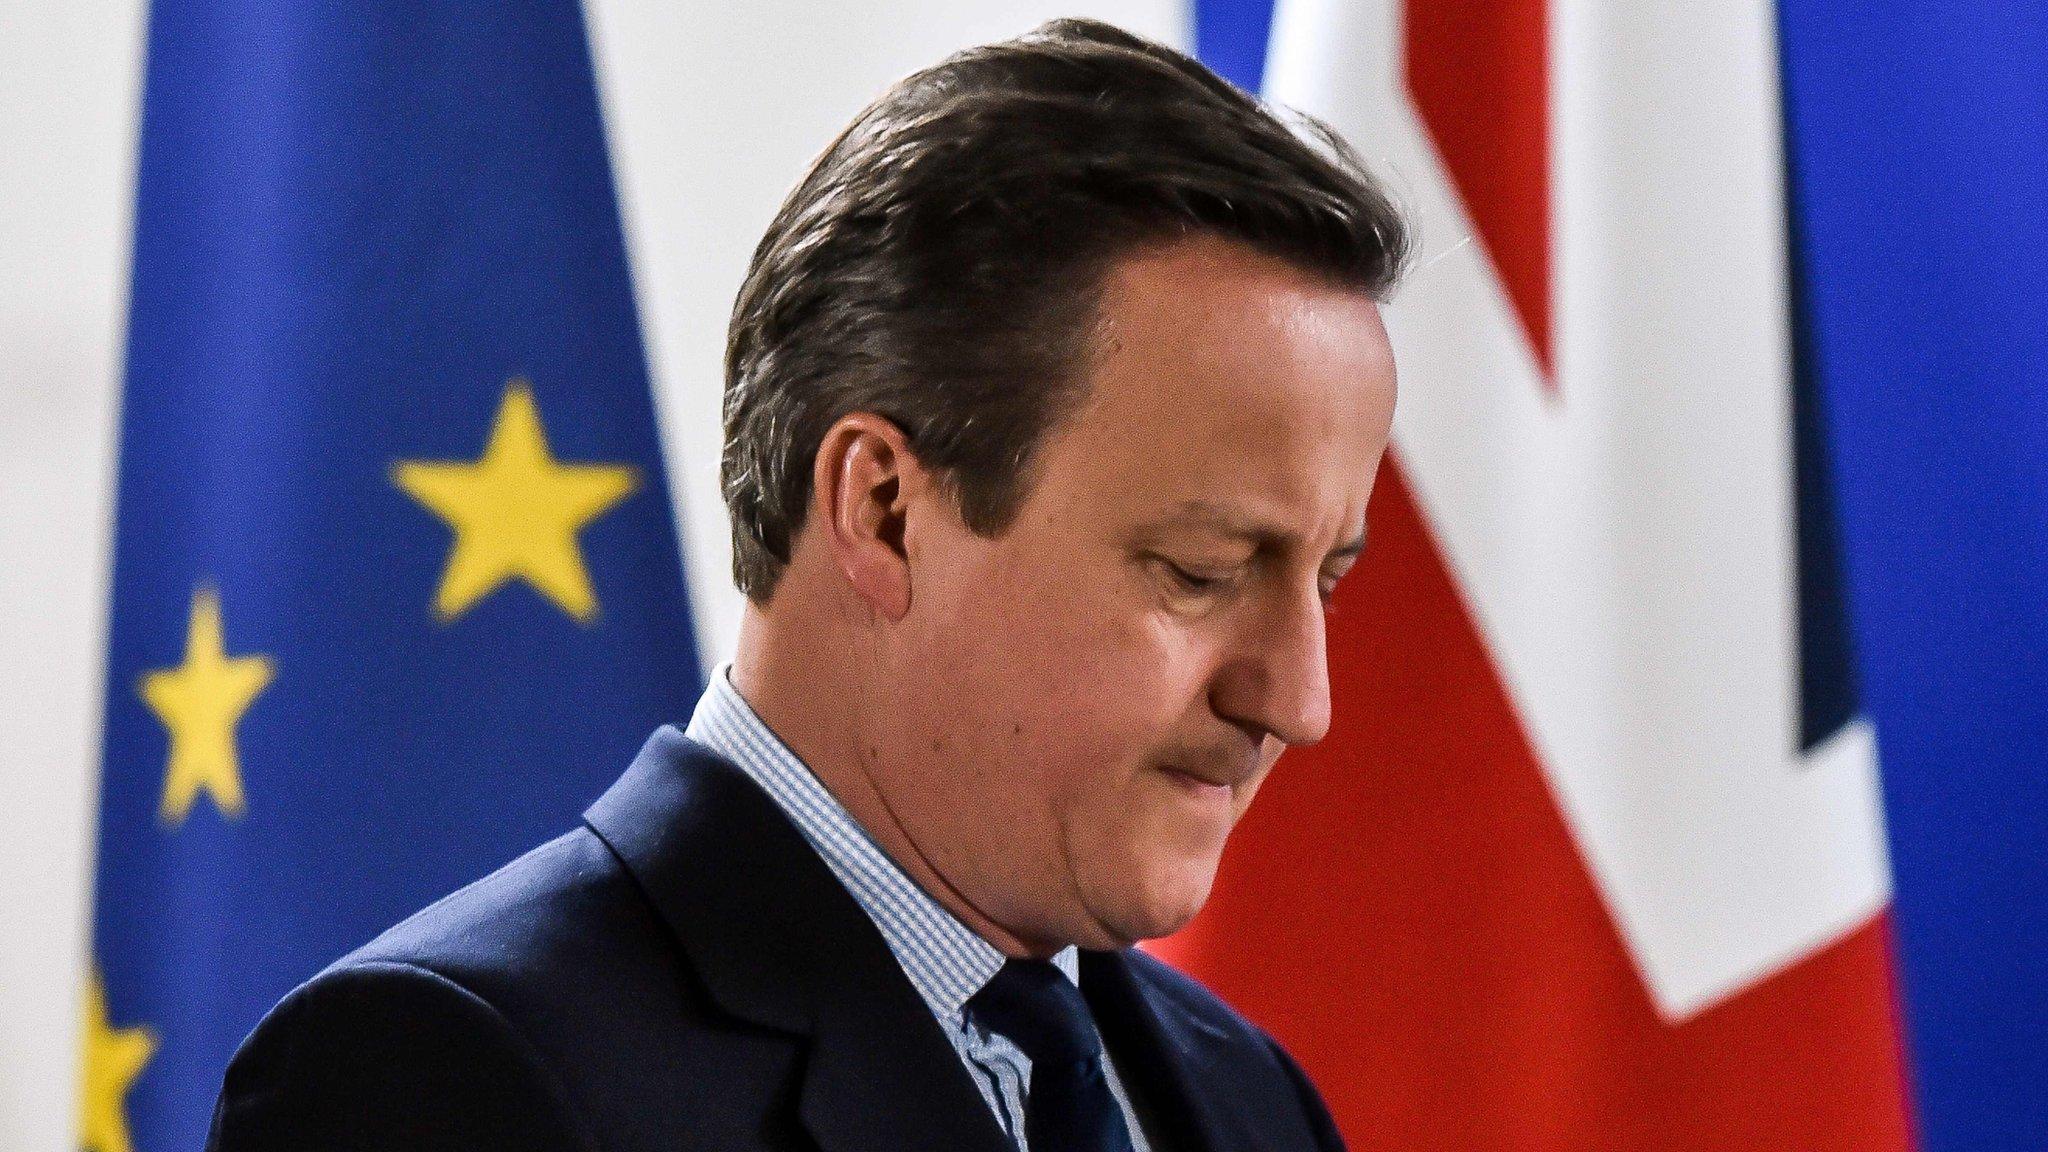 David Cameron: UK 'will not turn its back on Europe'